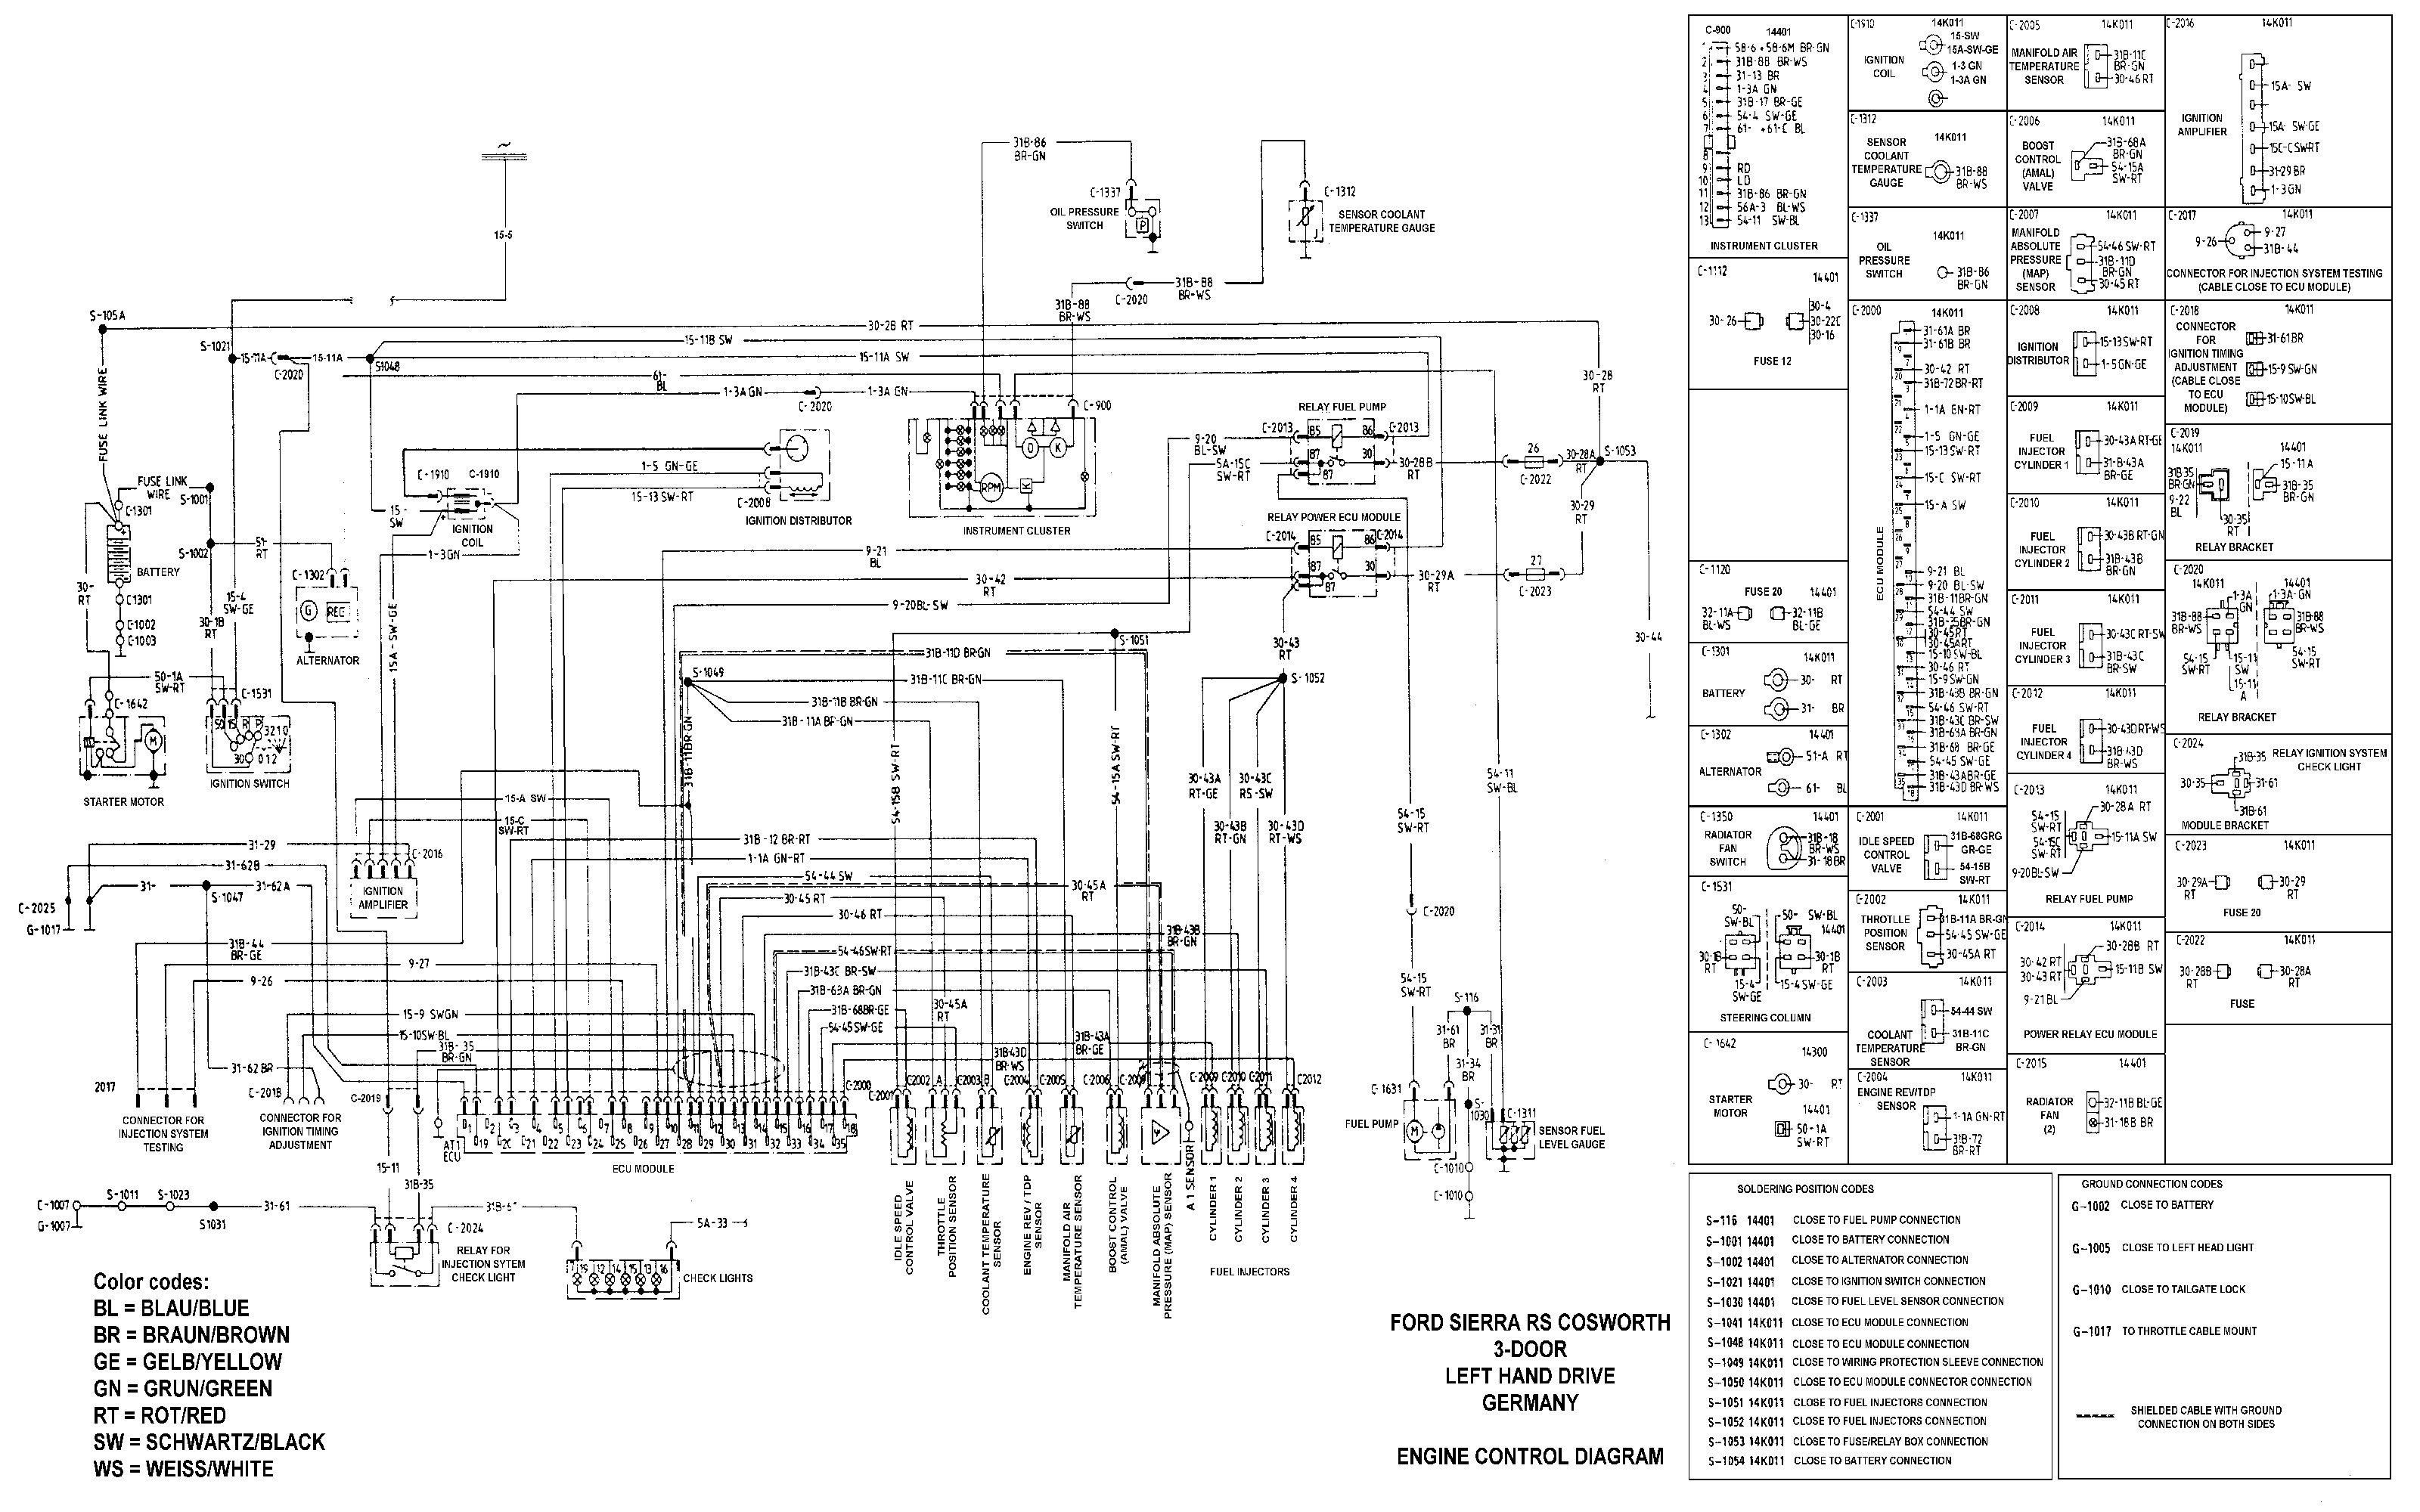 2012 ford fiesta wiring diagrams | refund-convinc wiring diagram ran -  refund-convinc.rolltec-automotive.eu  rolltec-automotive.eu